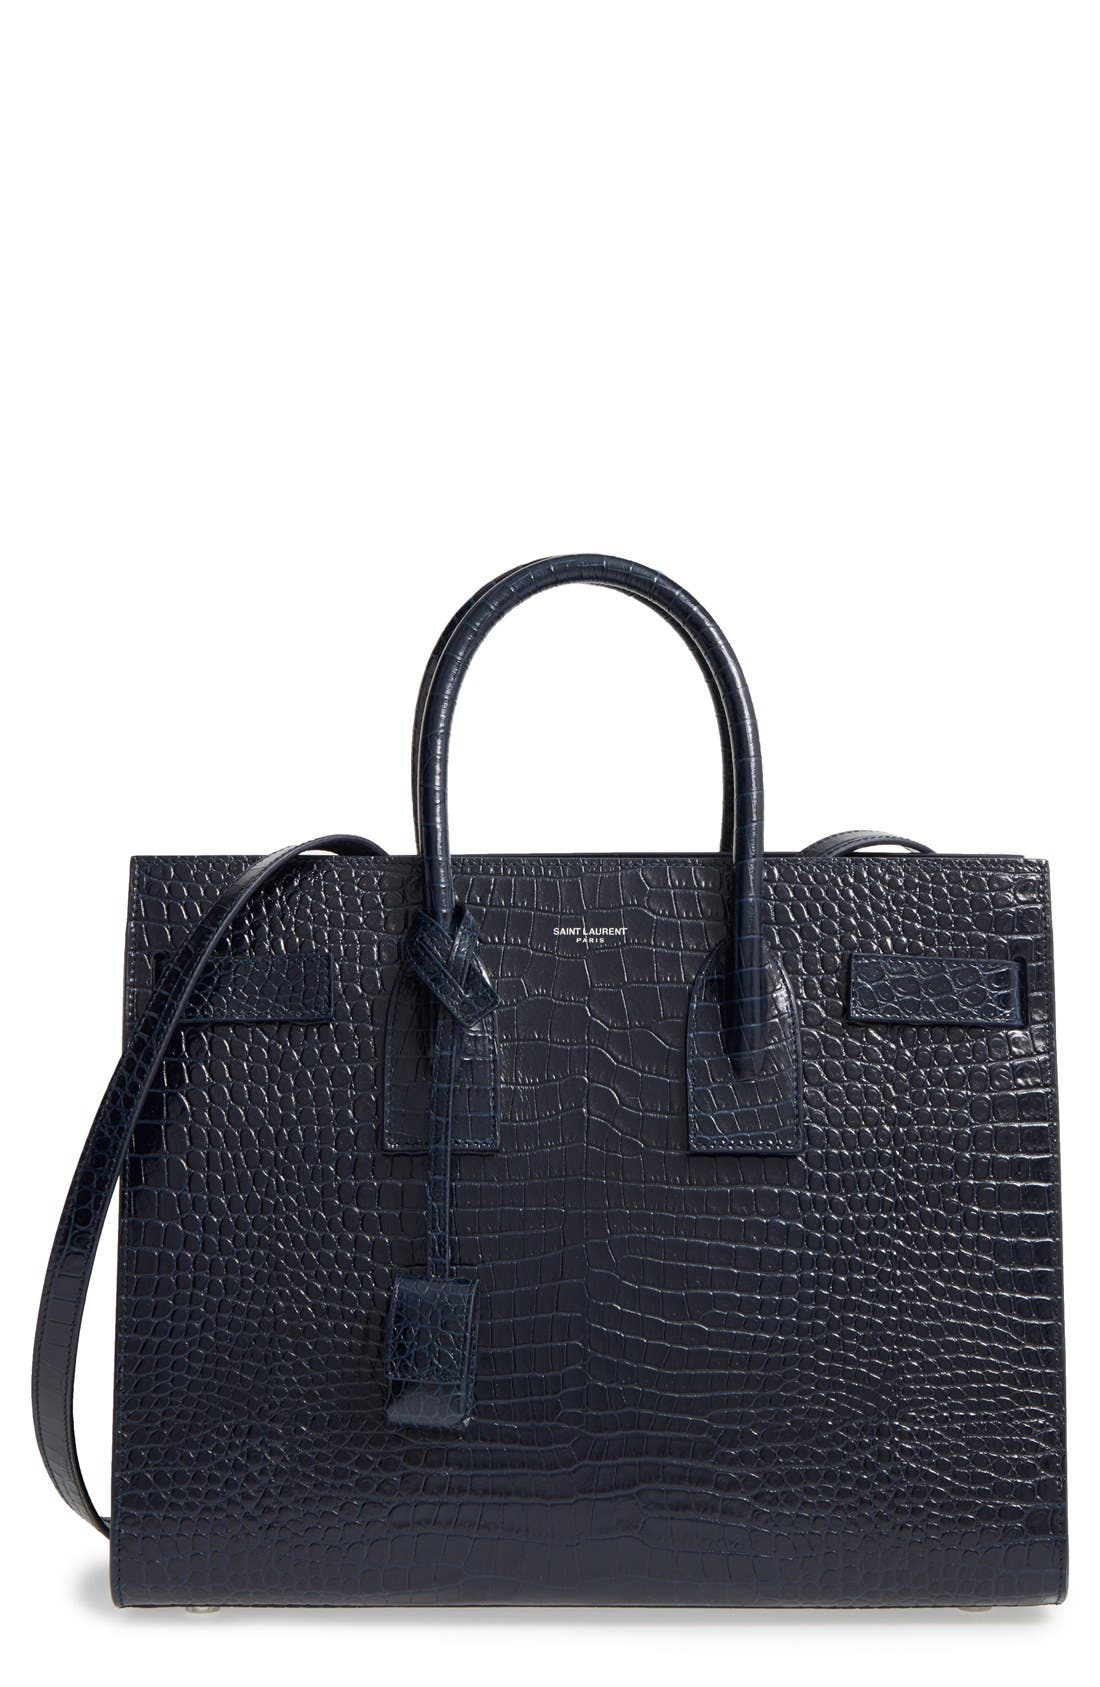 Alternate Image 1 Selected - Saint Laurent Small Sac de Jour Croc Embossed Calfskin Leather Tote